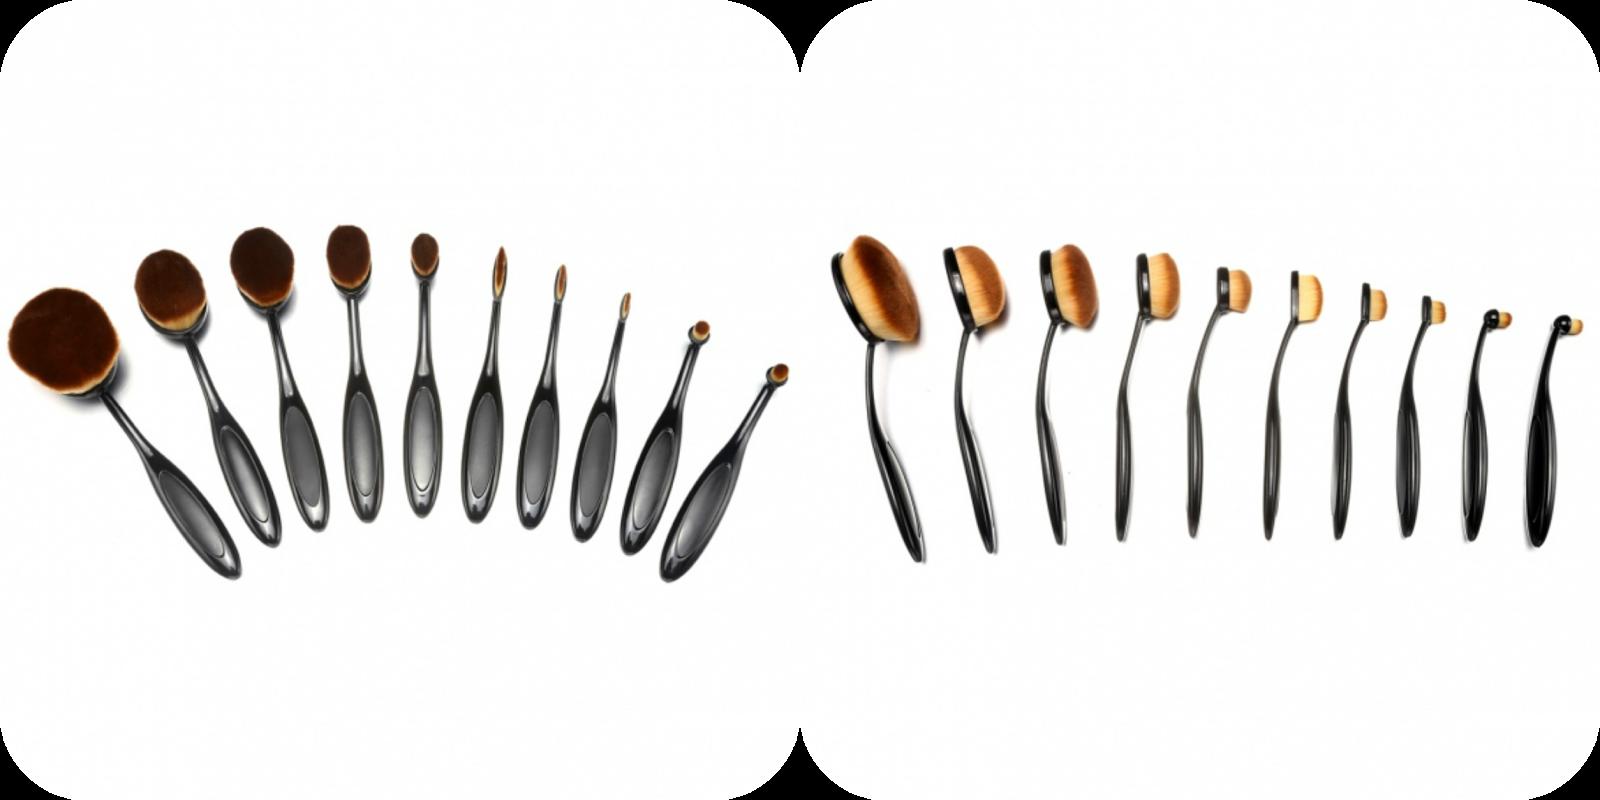 cae195bf130 1) New 10PCS Makeup Professional Foundation Brush Sets Facial Cream Powder  Toothbrush Shaped Brush Kit